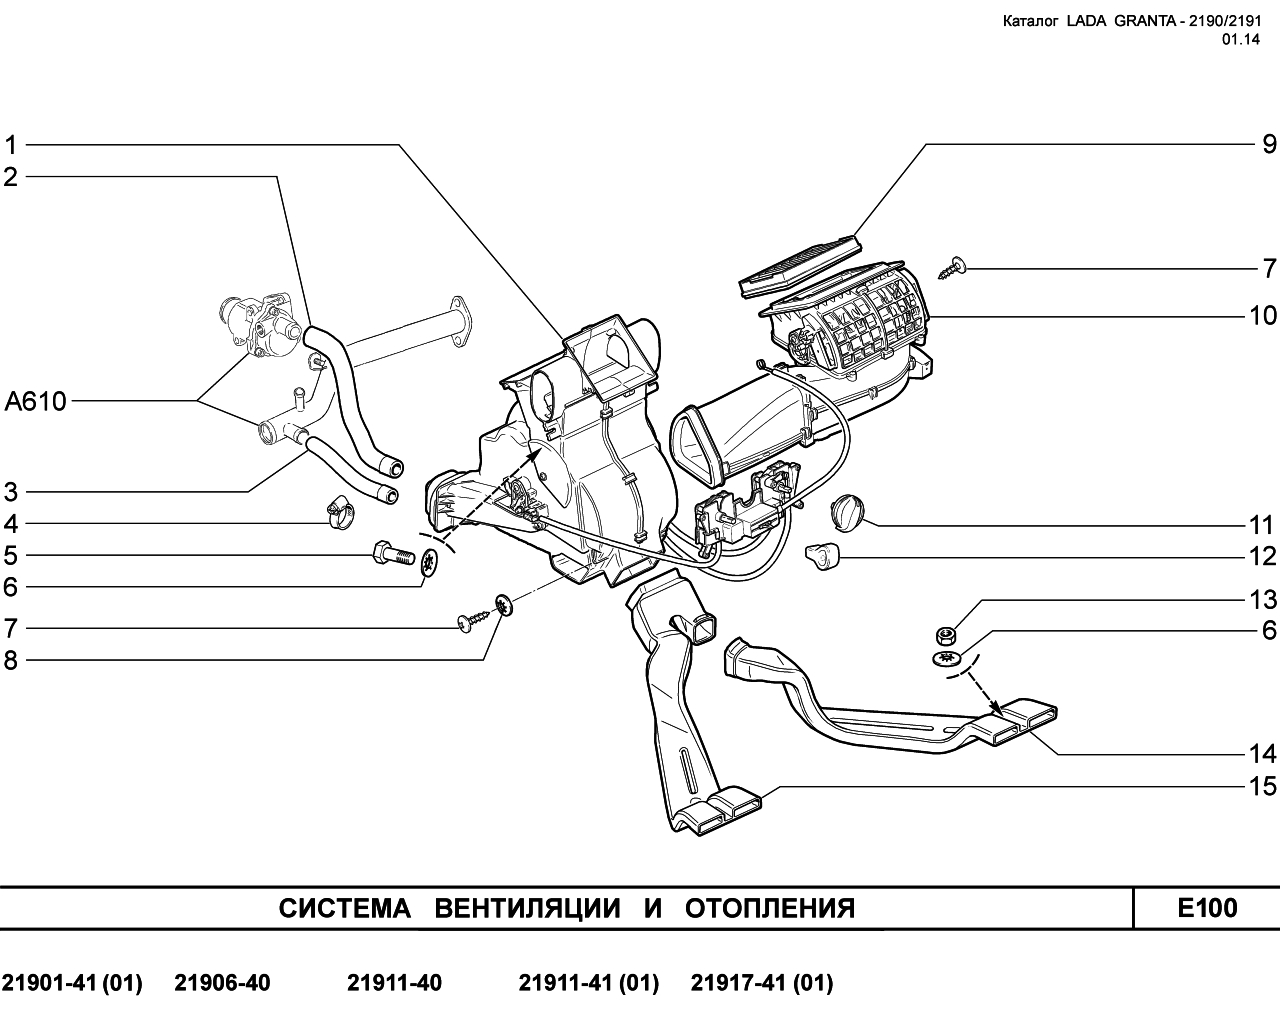 Схема отопления и вентиляции калина